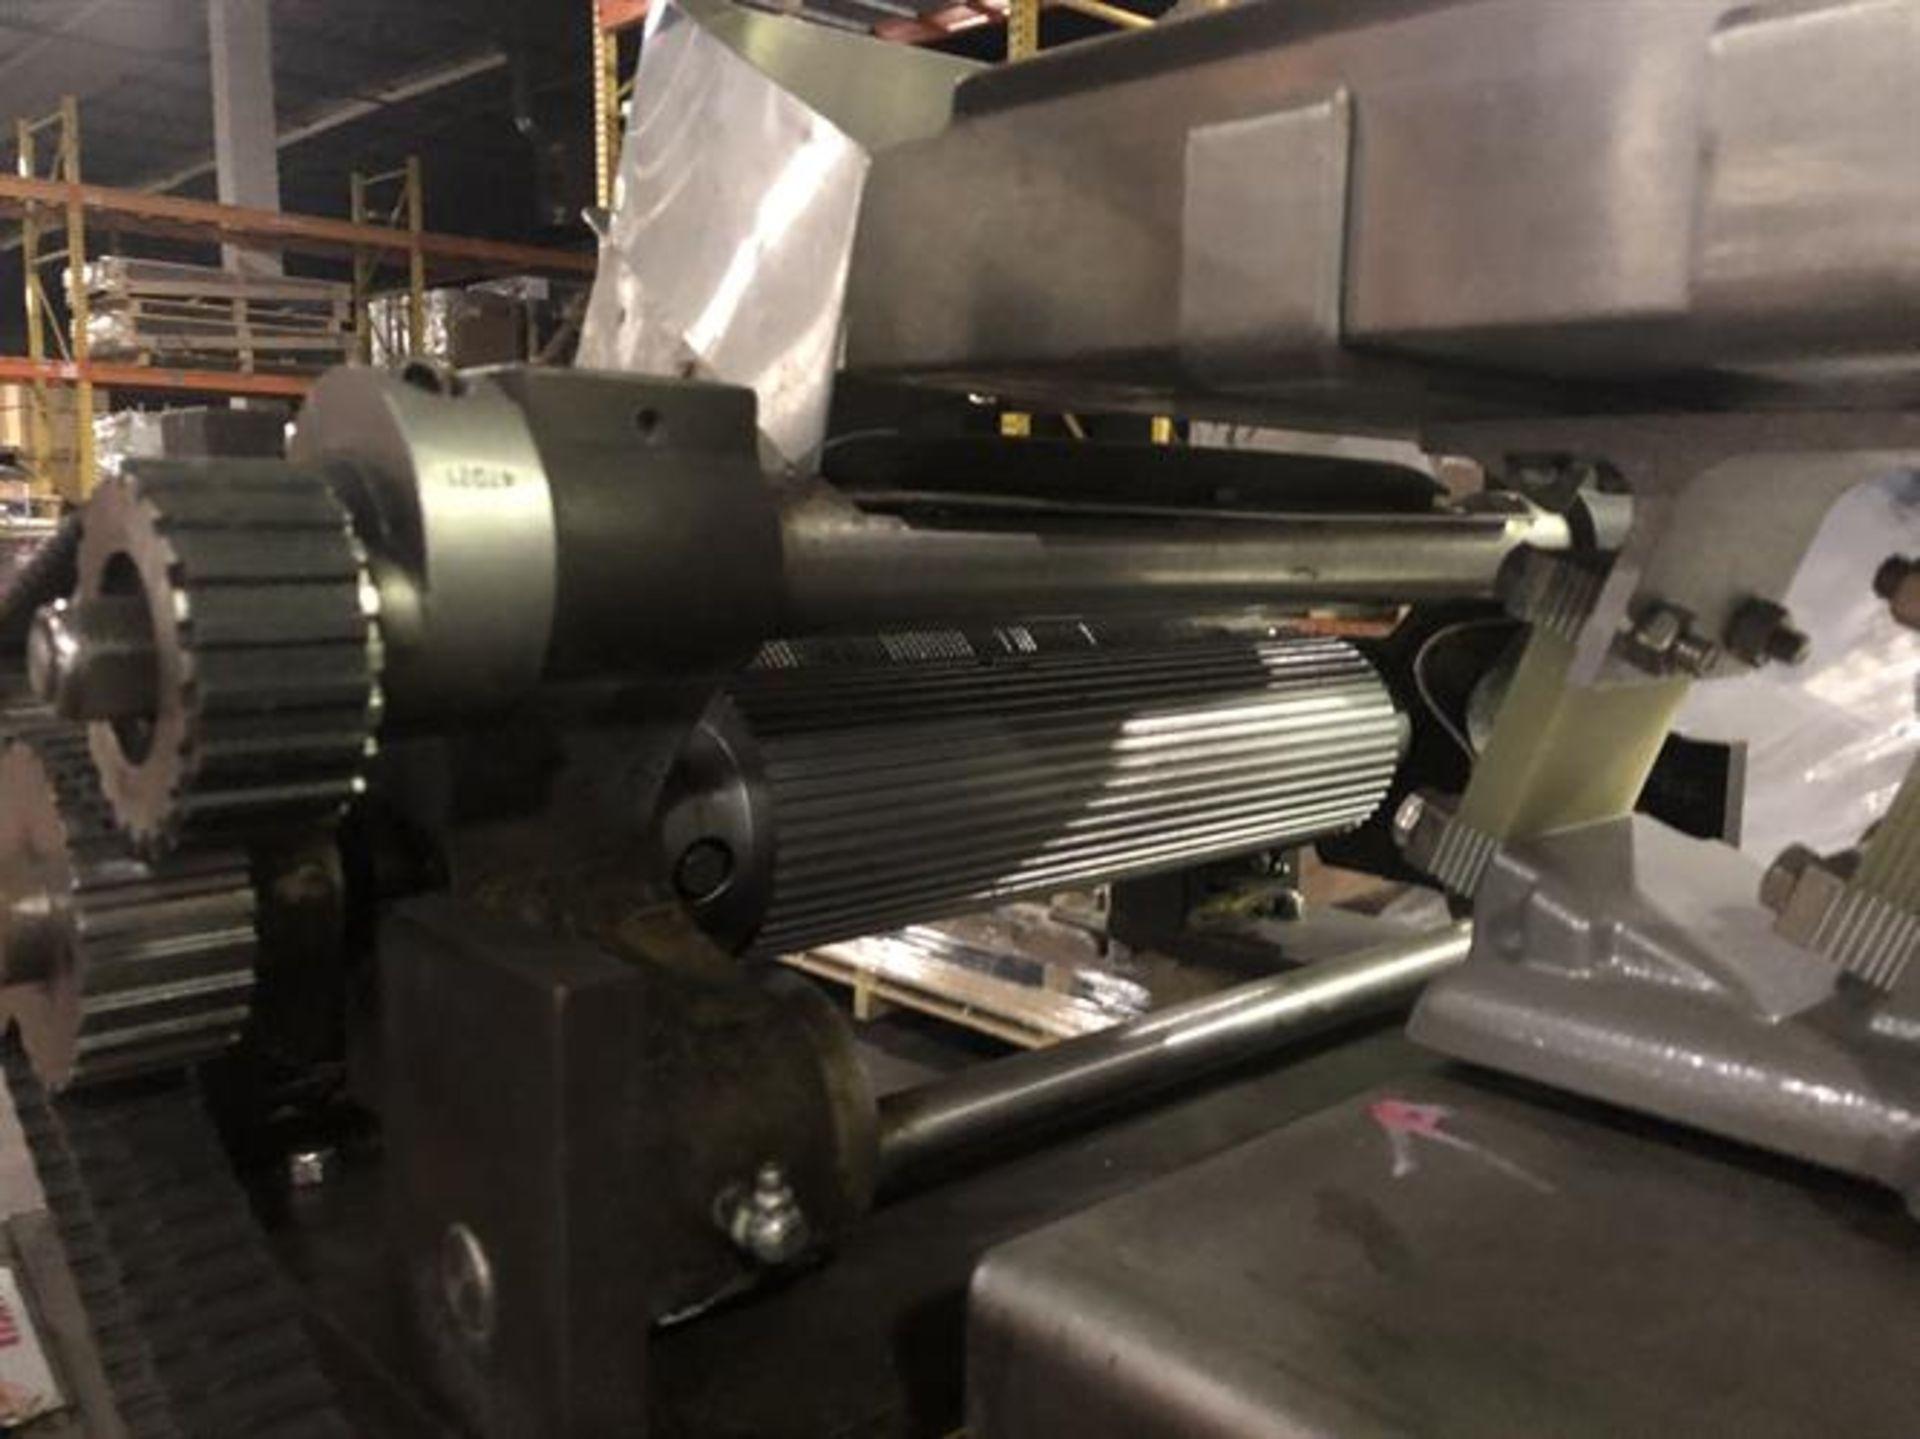 Urschel model N Stainless Steel Granulator - Vibrator pan feeder with variable speed rheostat - - Image 7 of 18